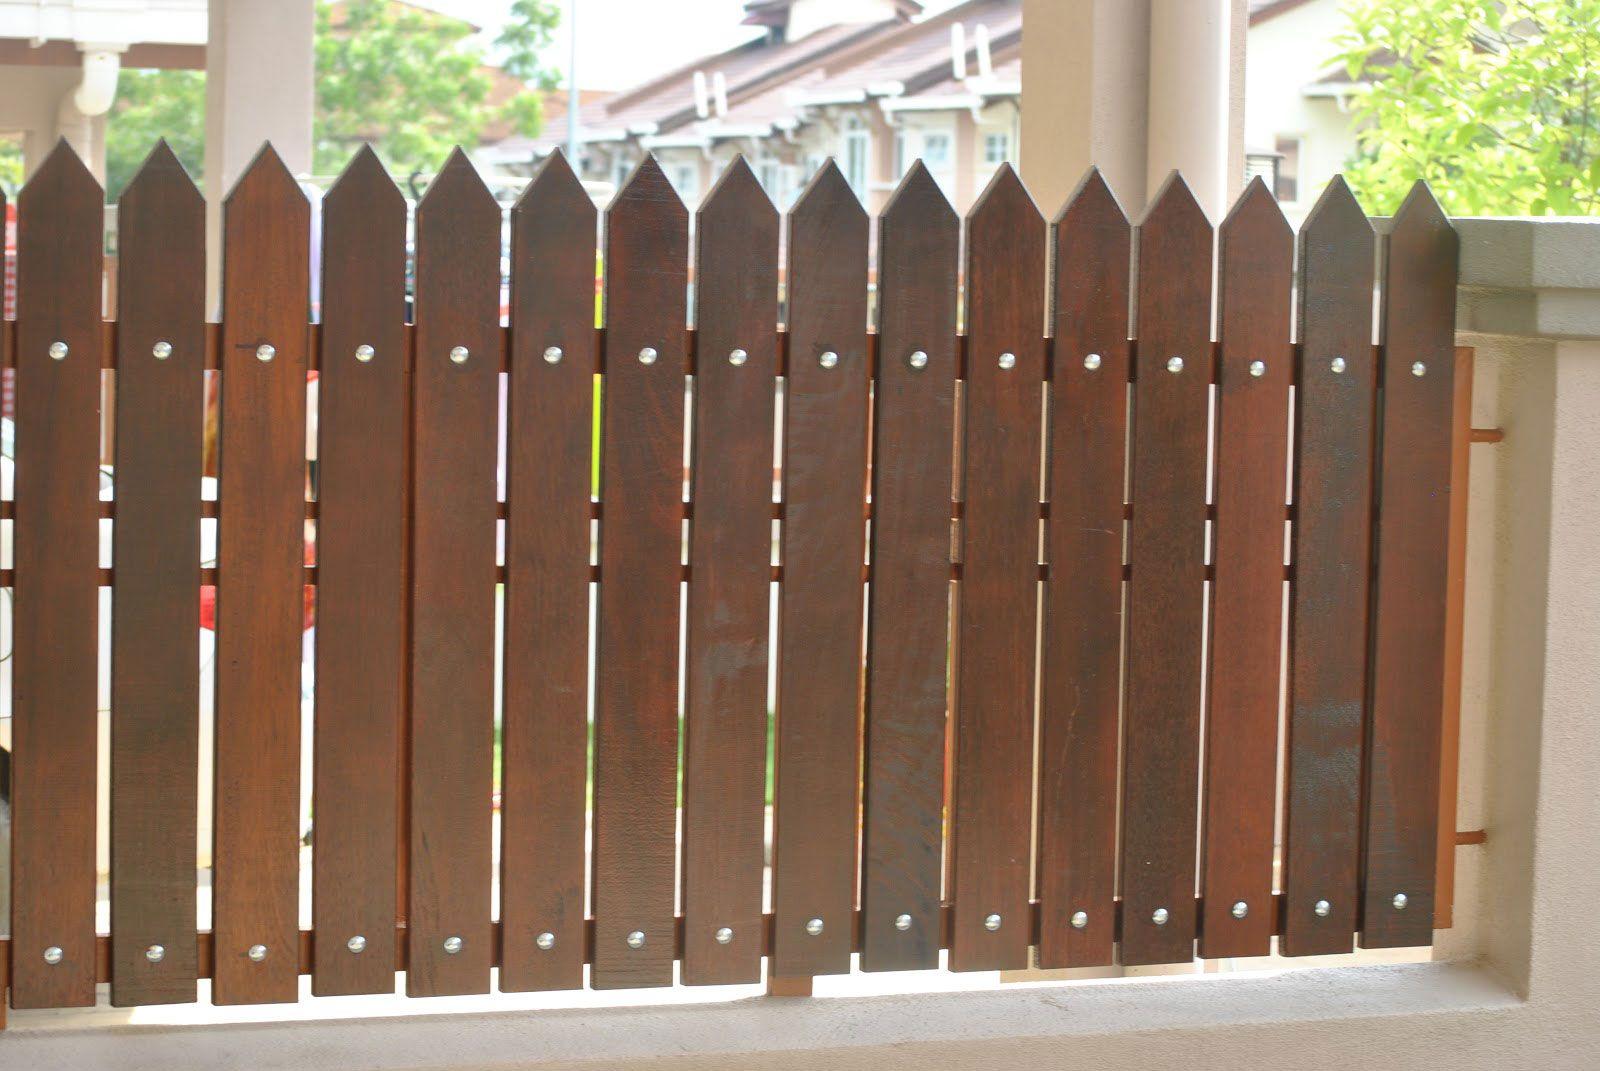 70 Model Pagar Rumah Minimalis (Kayu Dan Besi) - Dalam Membangun Sebuah  Rumah, Pagar Merupakan Satu Komponen Yang Cukup Pe… | Pagar Kayu, Rumah  Minimalis, Ide Pagar